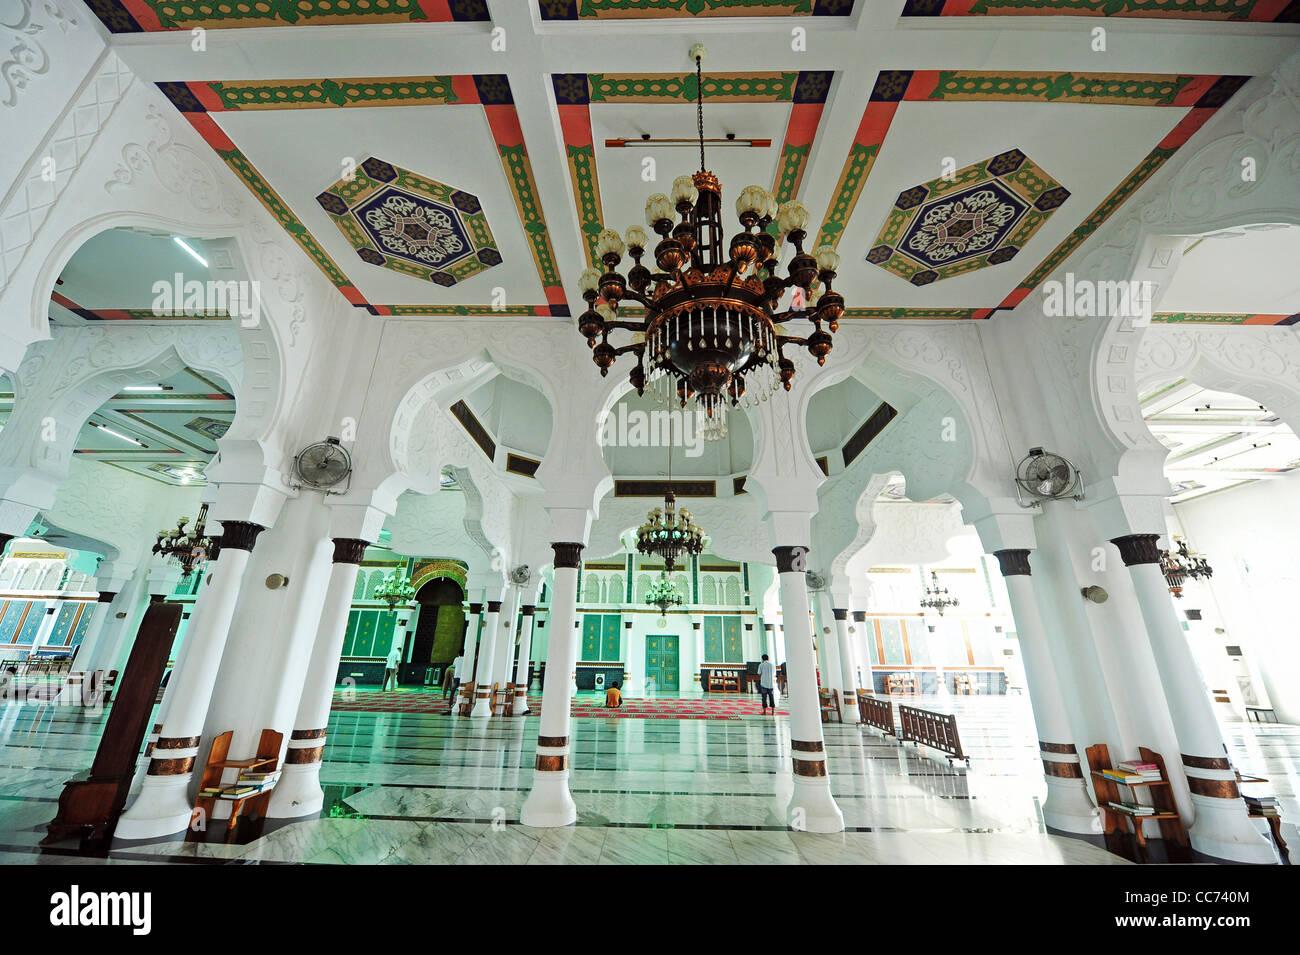 Indonesia Sumatra Banda Aceh Inside The Baiturrahman Grand Mosque Mesjid Raya Baiturrahman Stock Photo Alamy